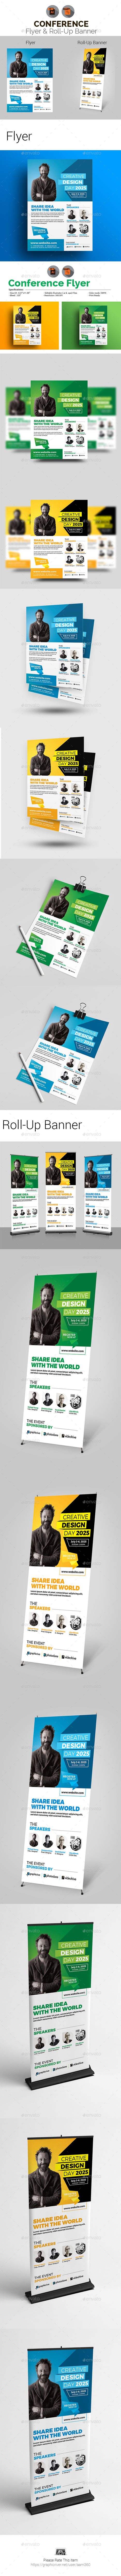 GraphicRiver Conference Flyer & Roll-Up Banner Bundle 21121143